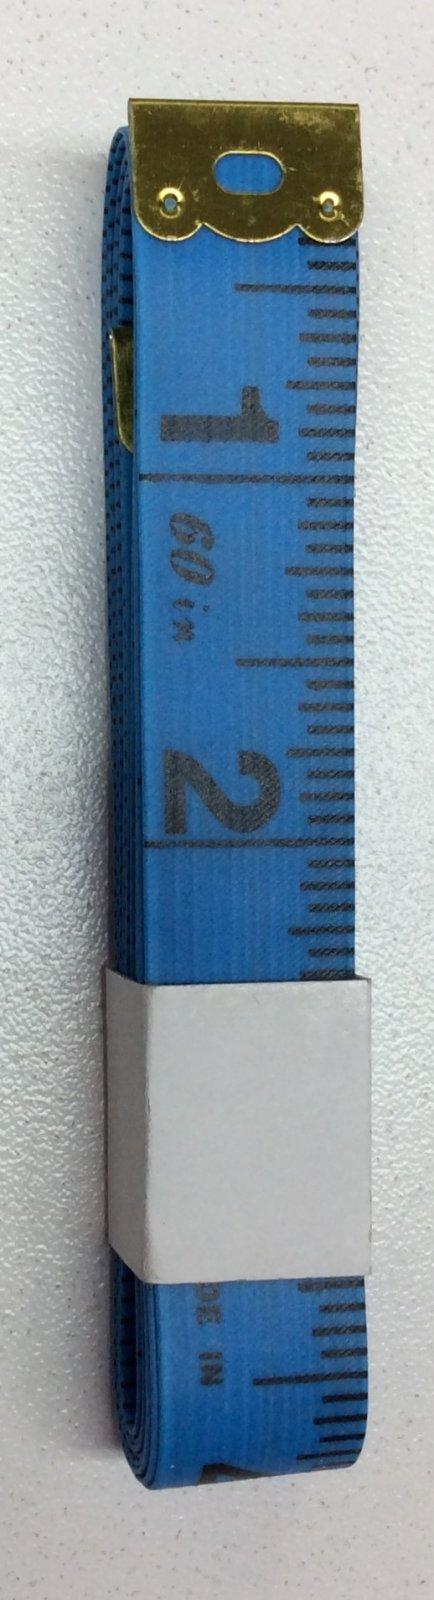 60 inch tape measure